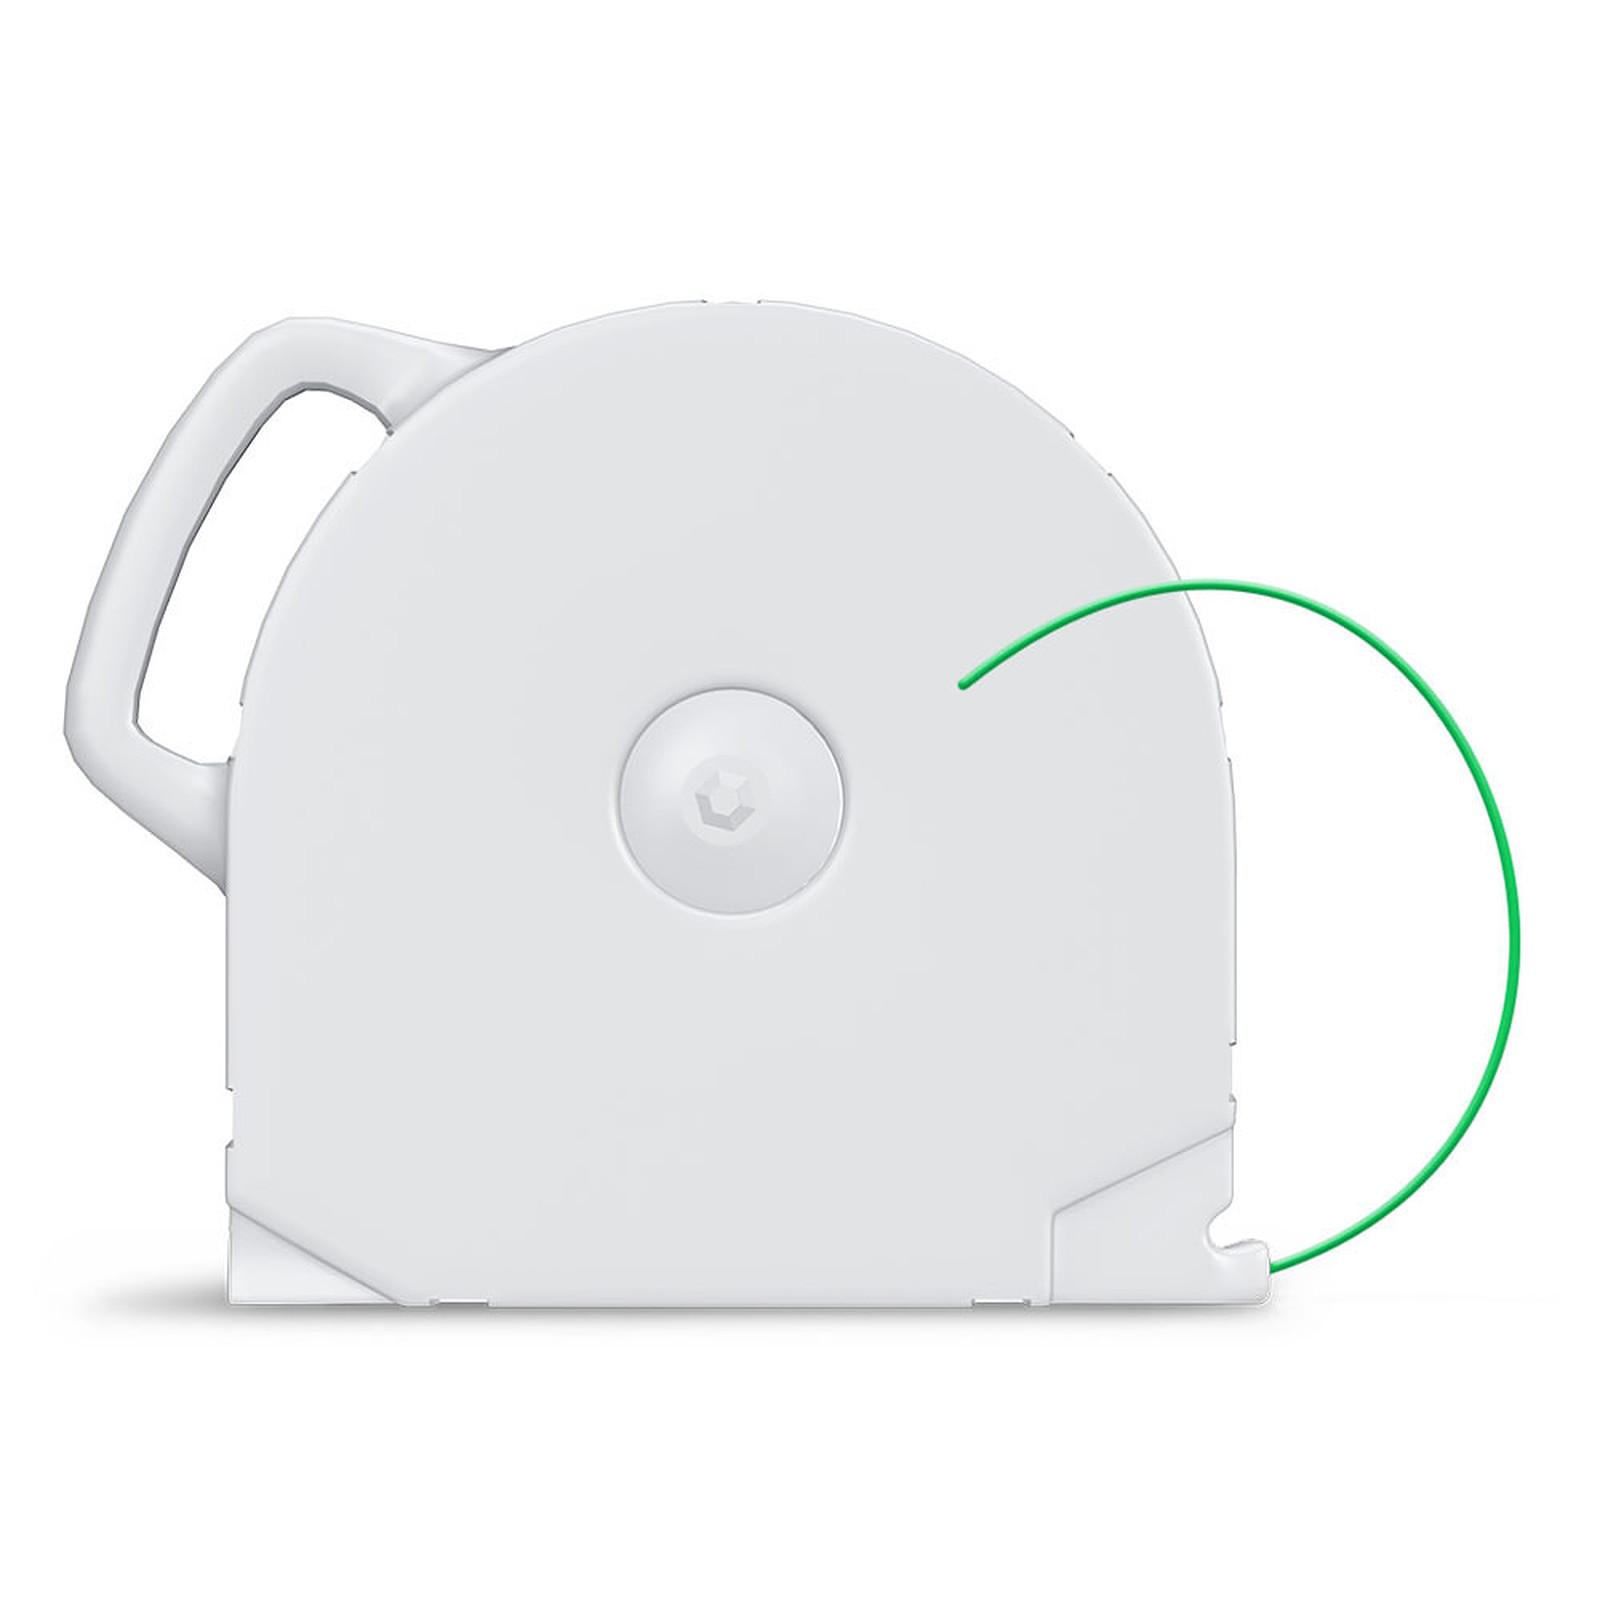 3DI 401398 - Cartouche PLA Verte pour imprimante 3D